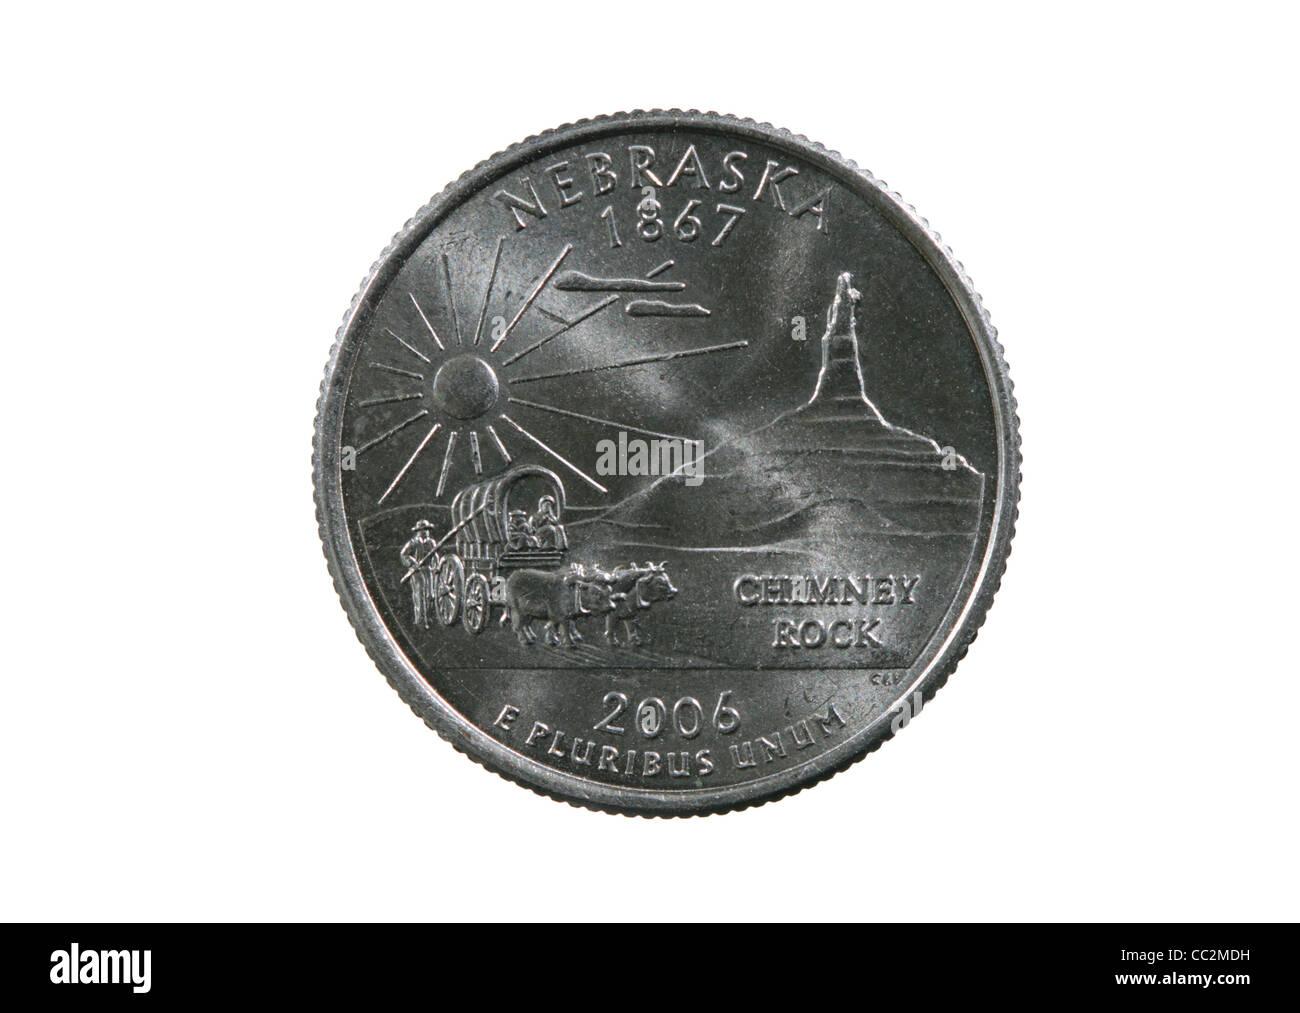 Nebraska state quarter coin isolated on white background - Stock Image